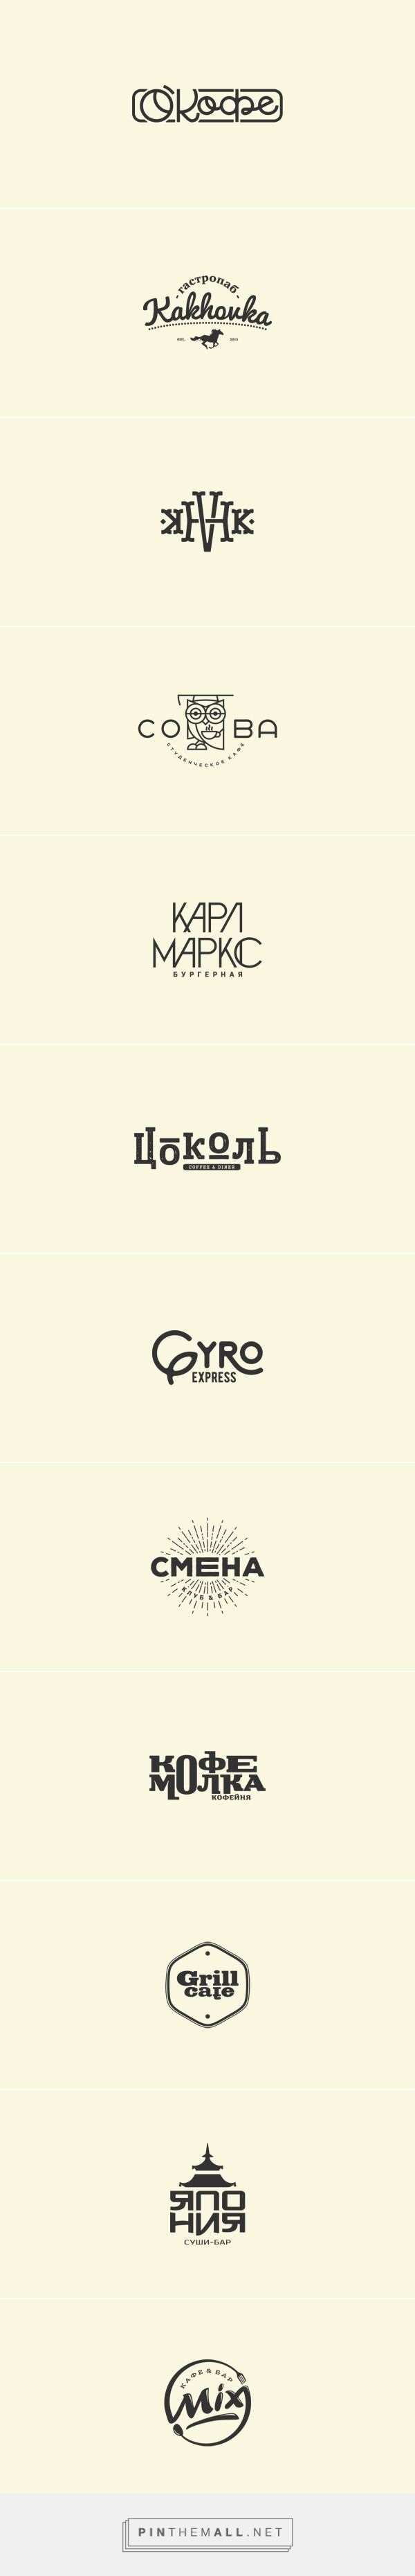 Cafe & Bar logos 2013-2015 on Behance - created via https://pinthemall.net